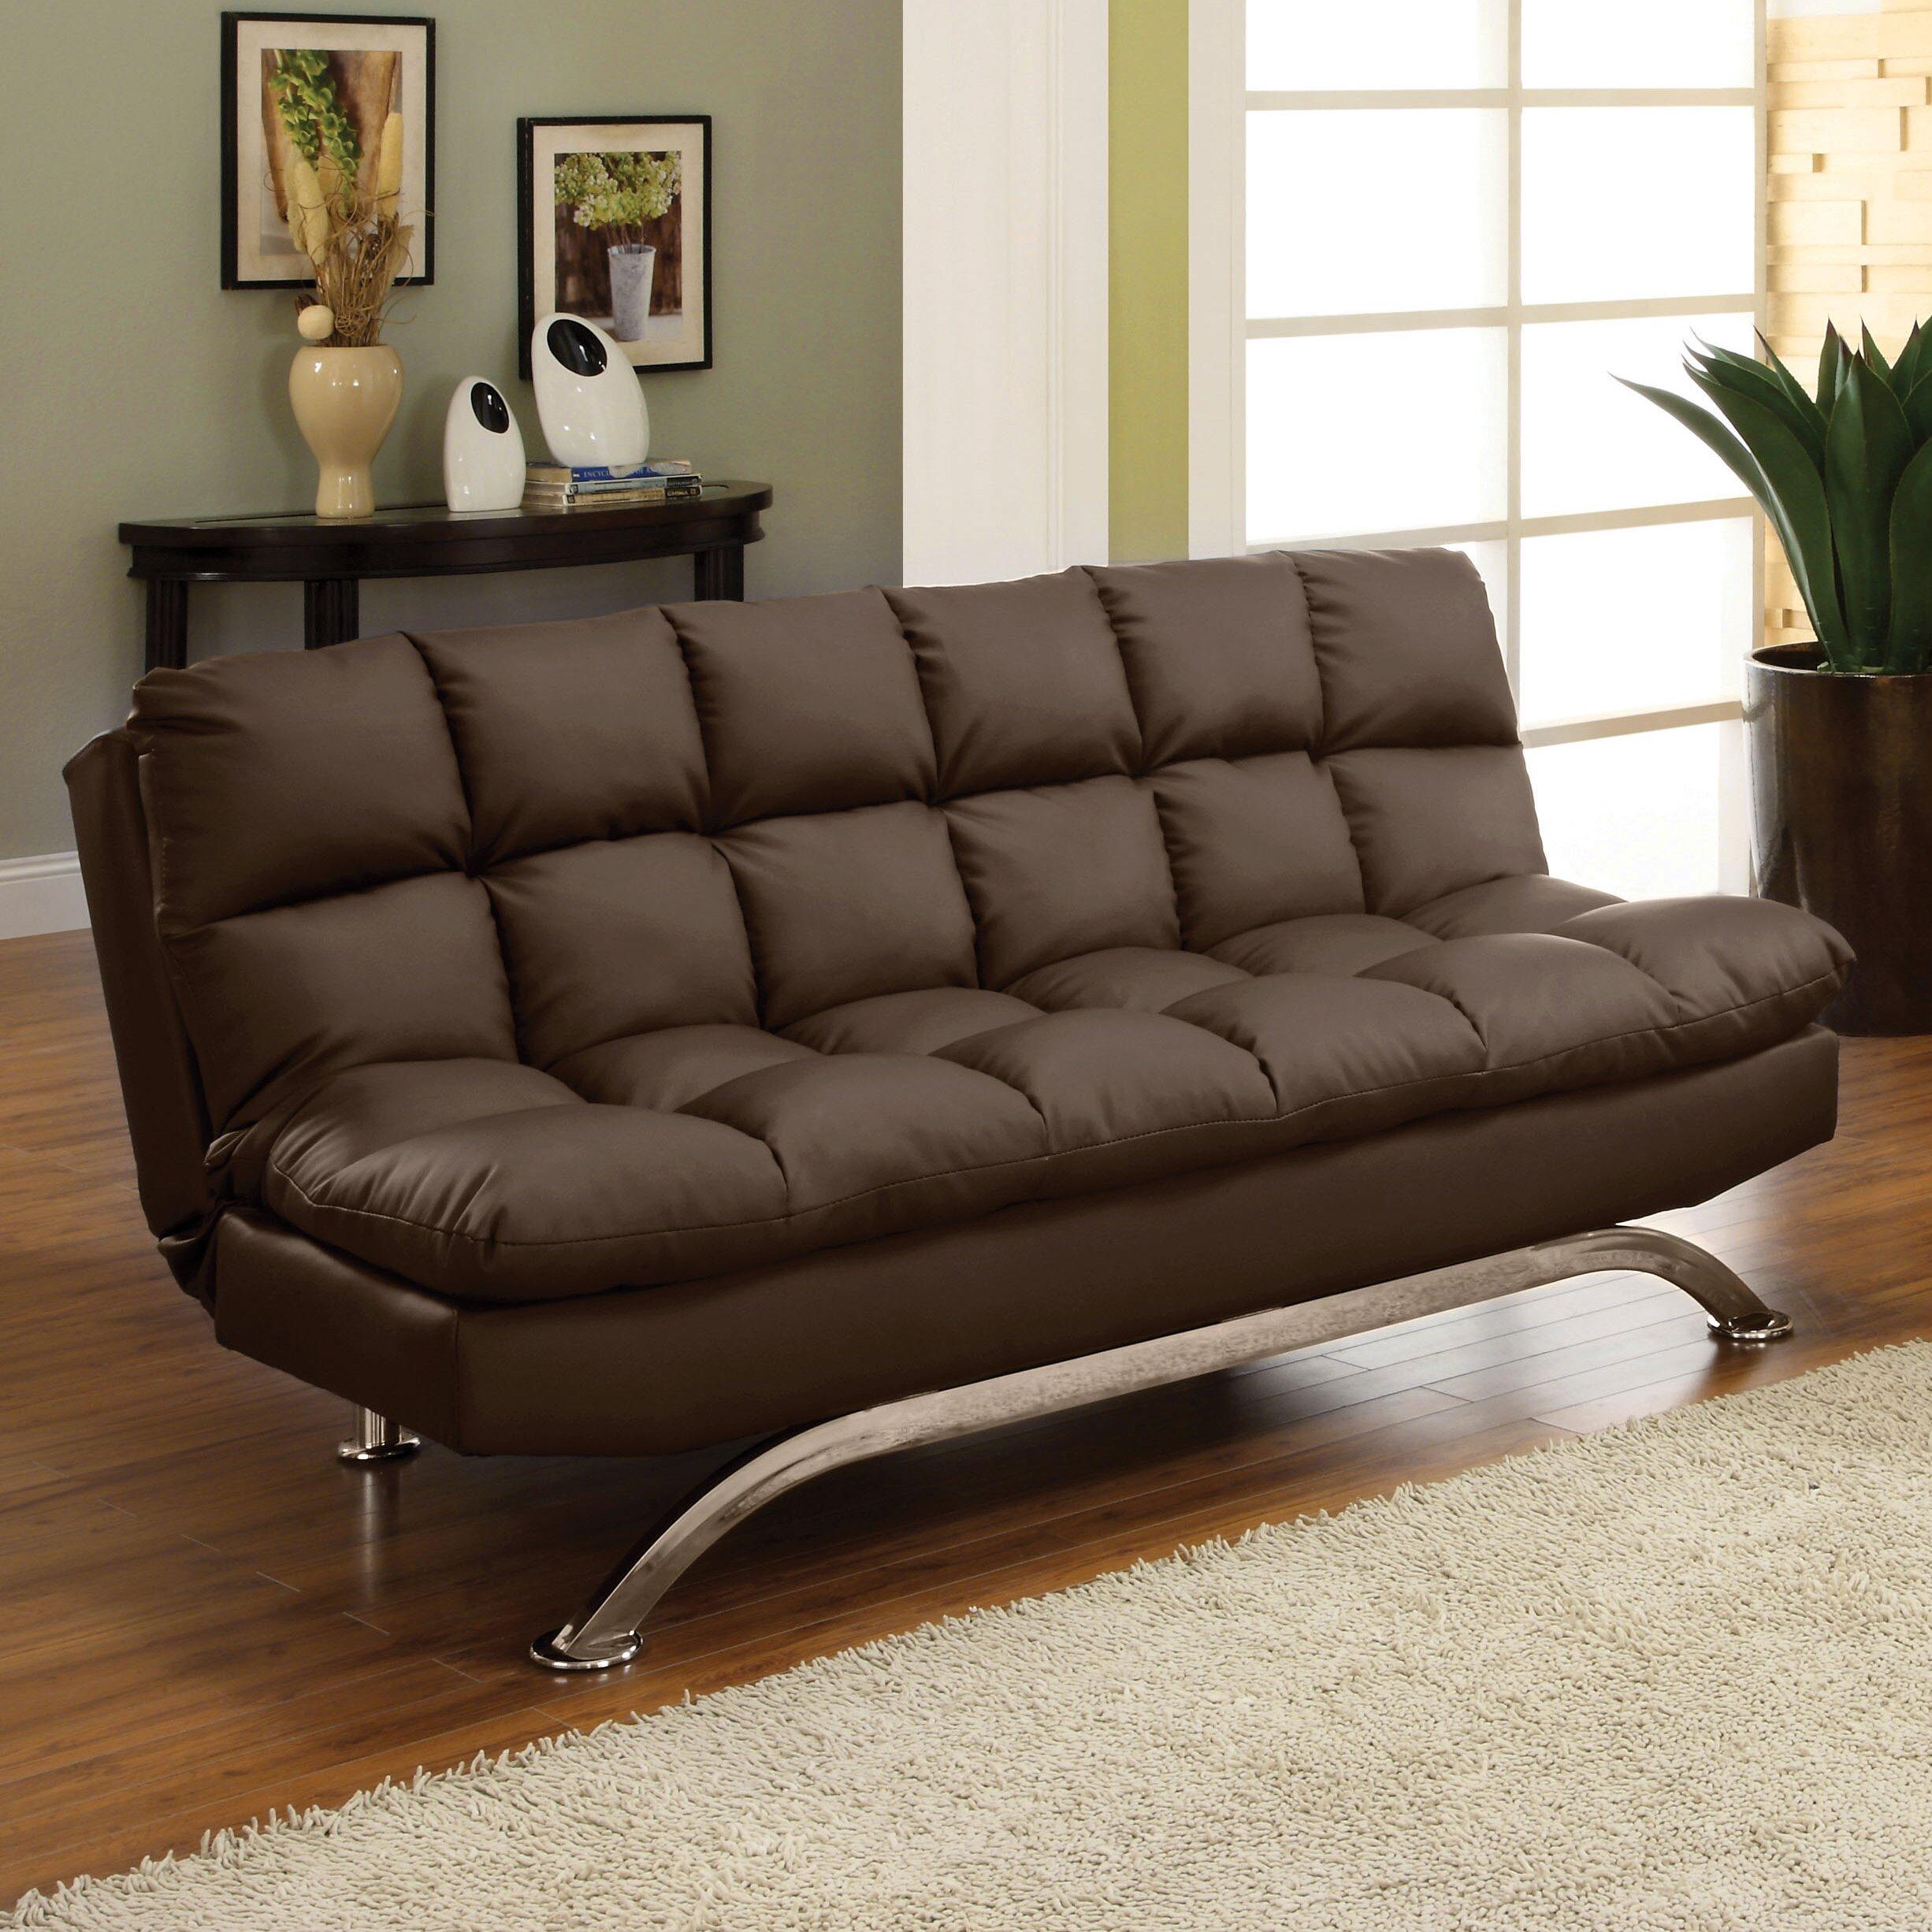 Hokku Designs Aristo Convertible Sofa & Reviews   Wayfair In Convertible Sectional Sofas (View 4 of 15)